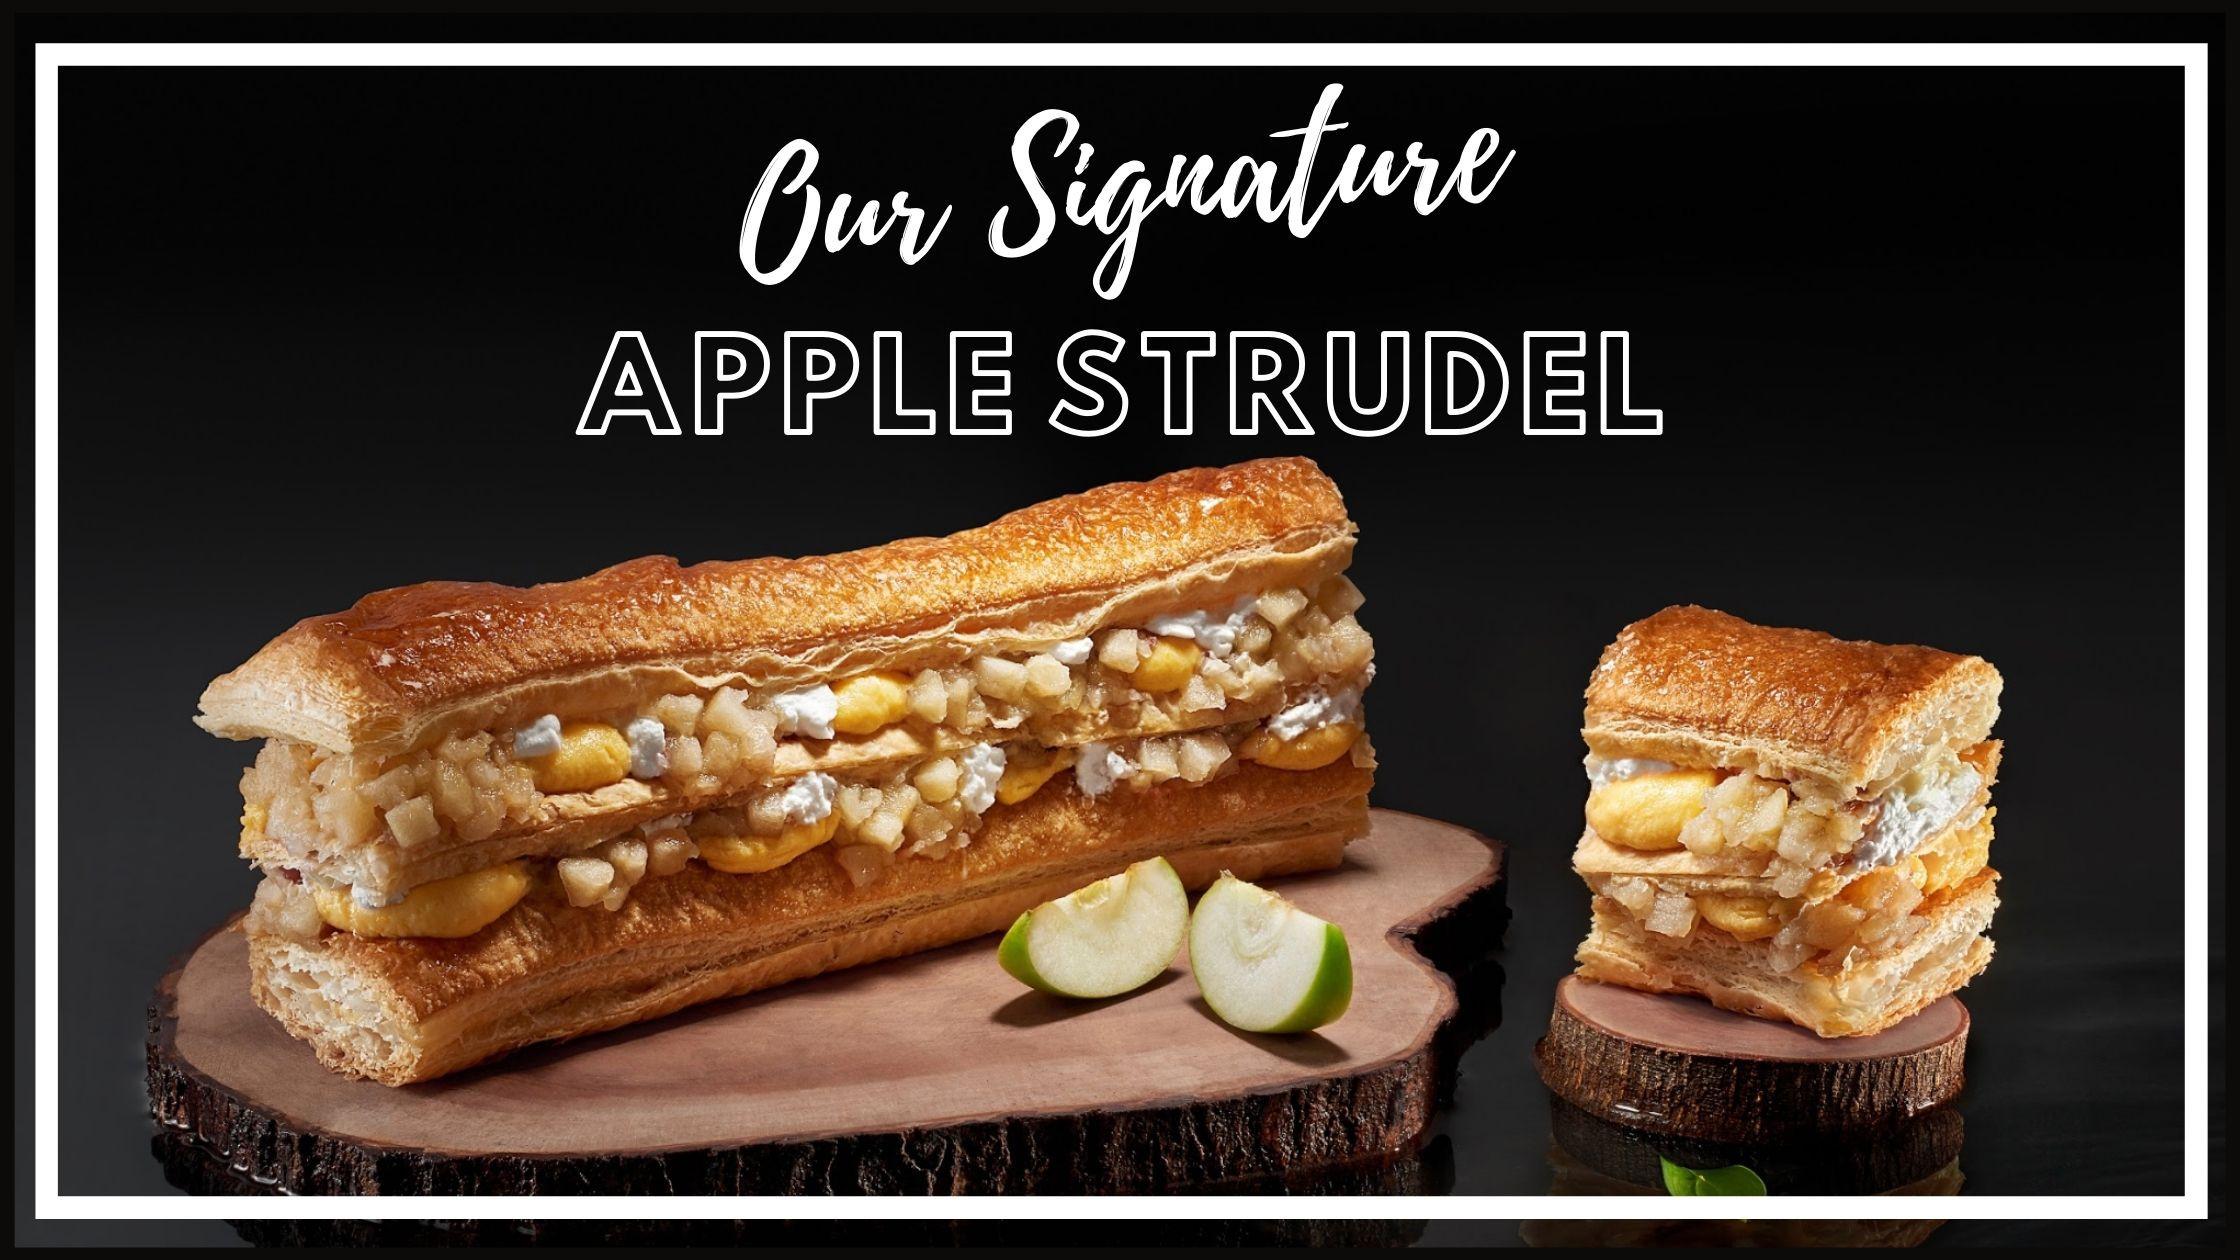 Apple Strudel Signature